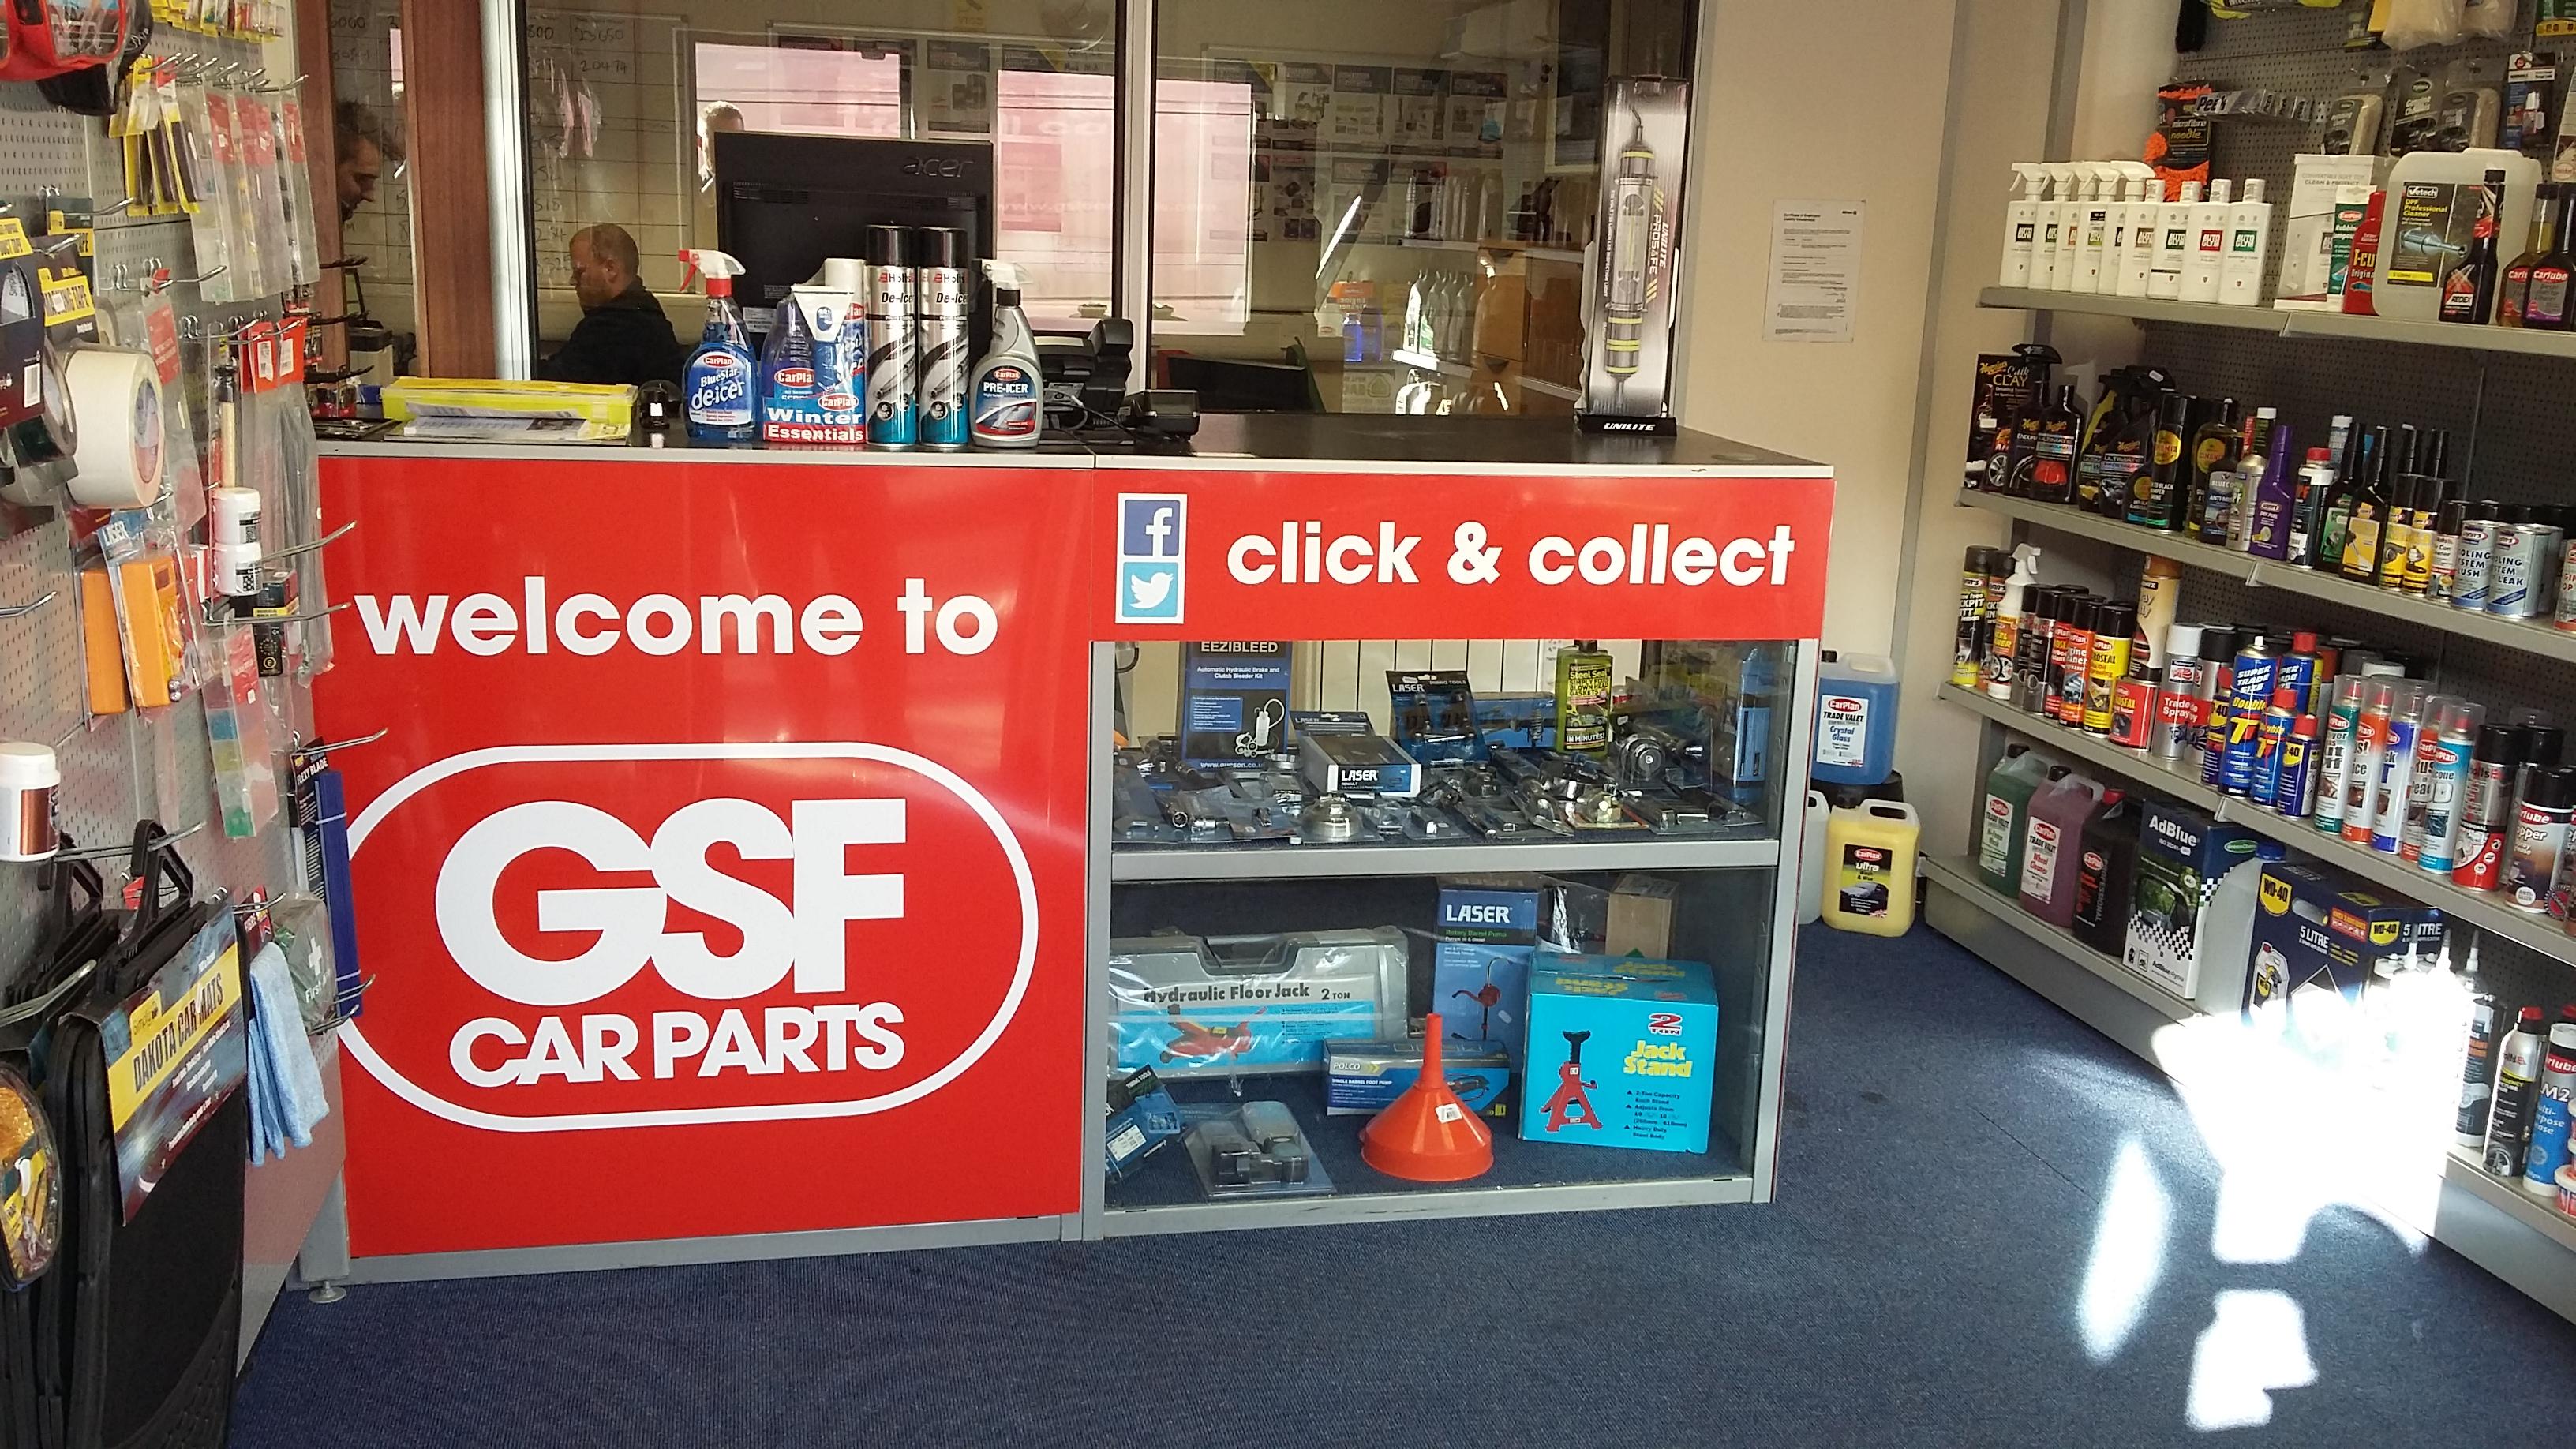 Gsf Car Parts Leeds